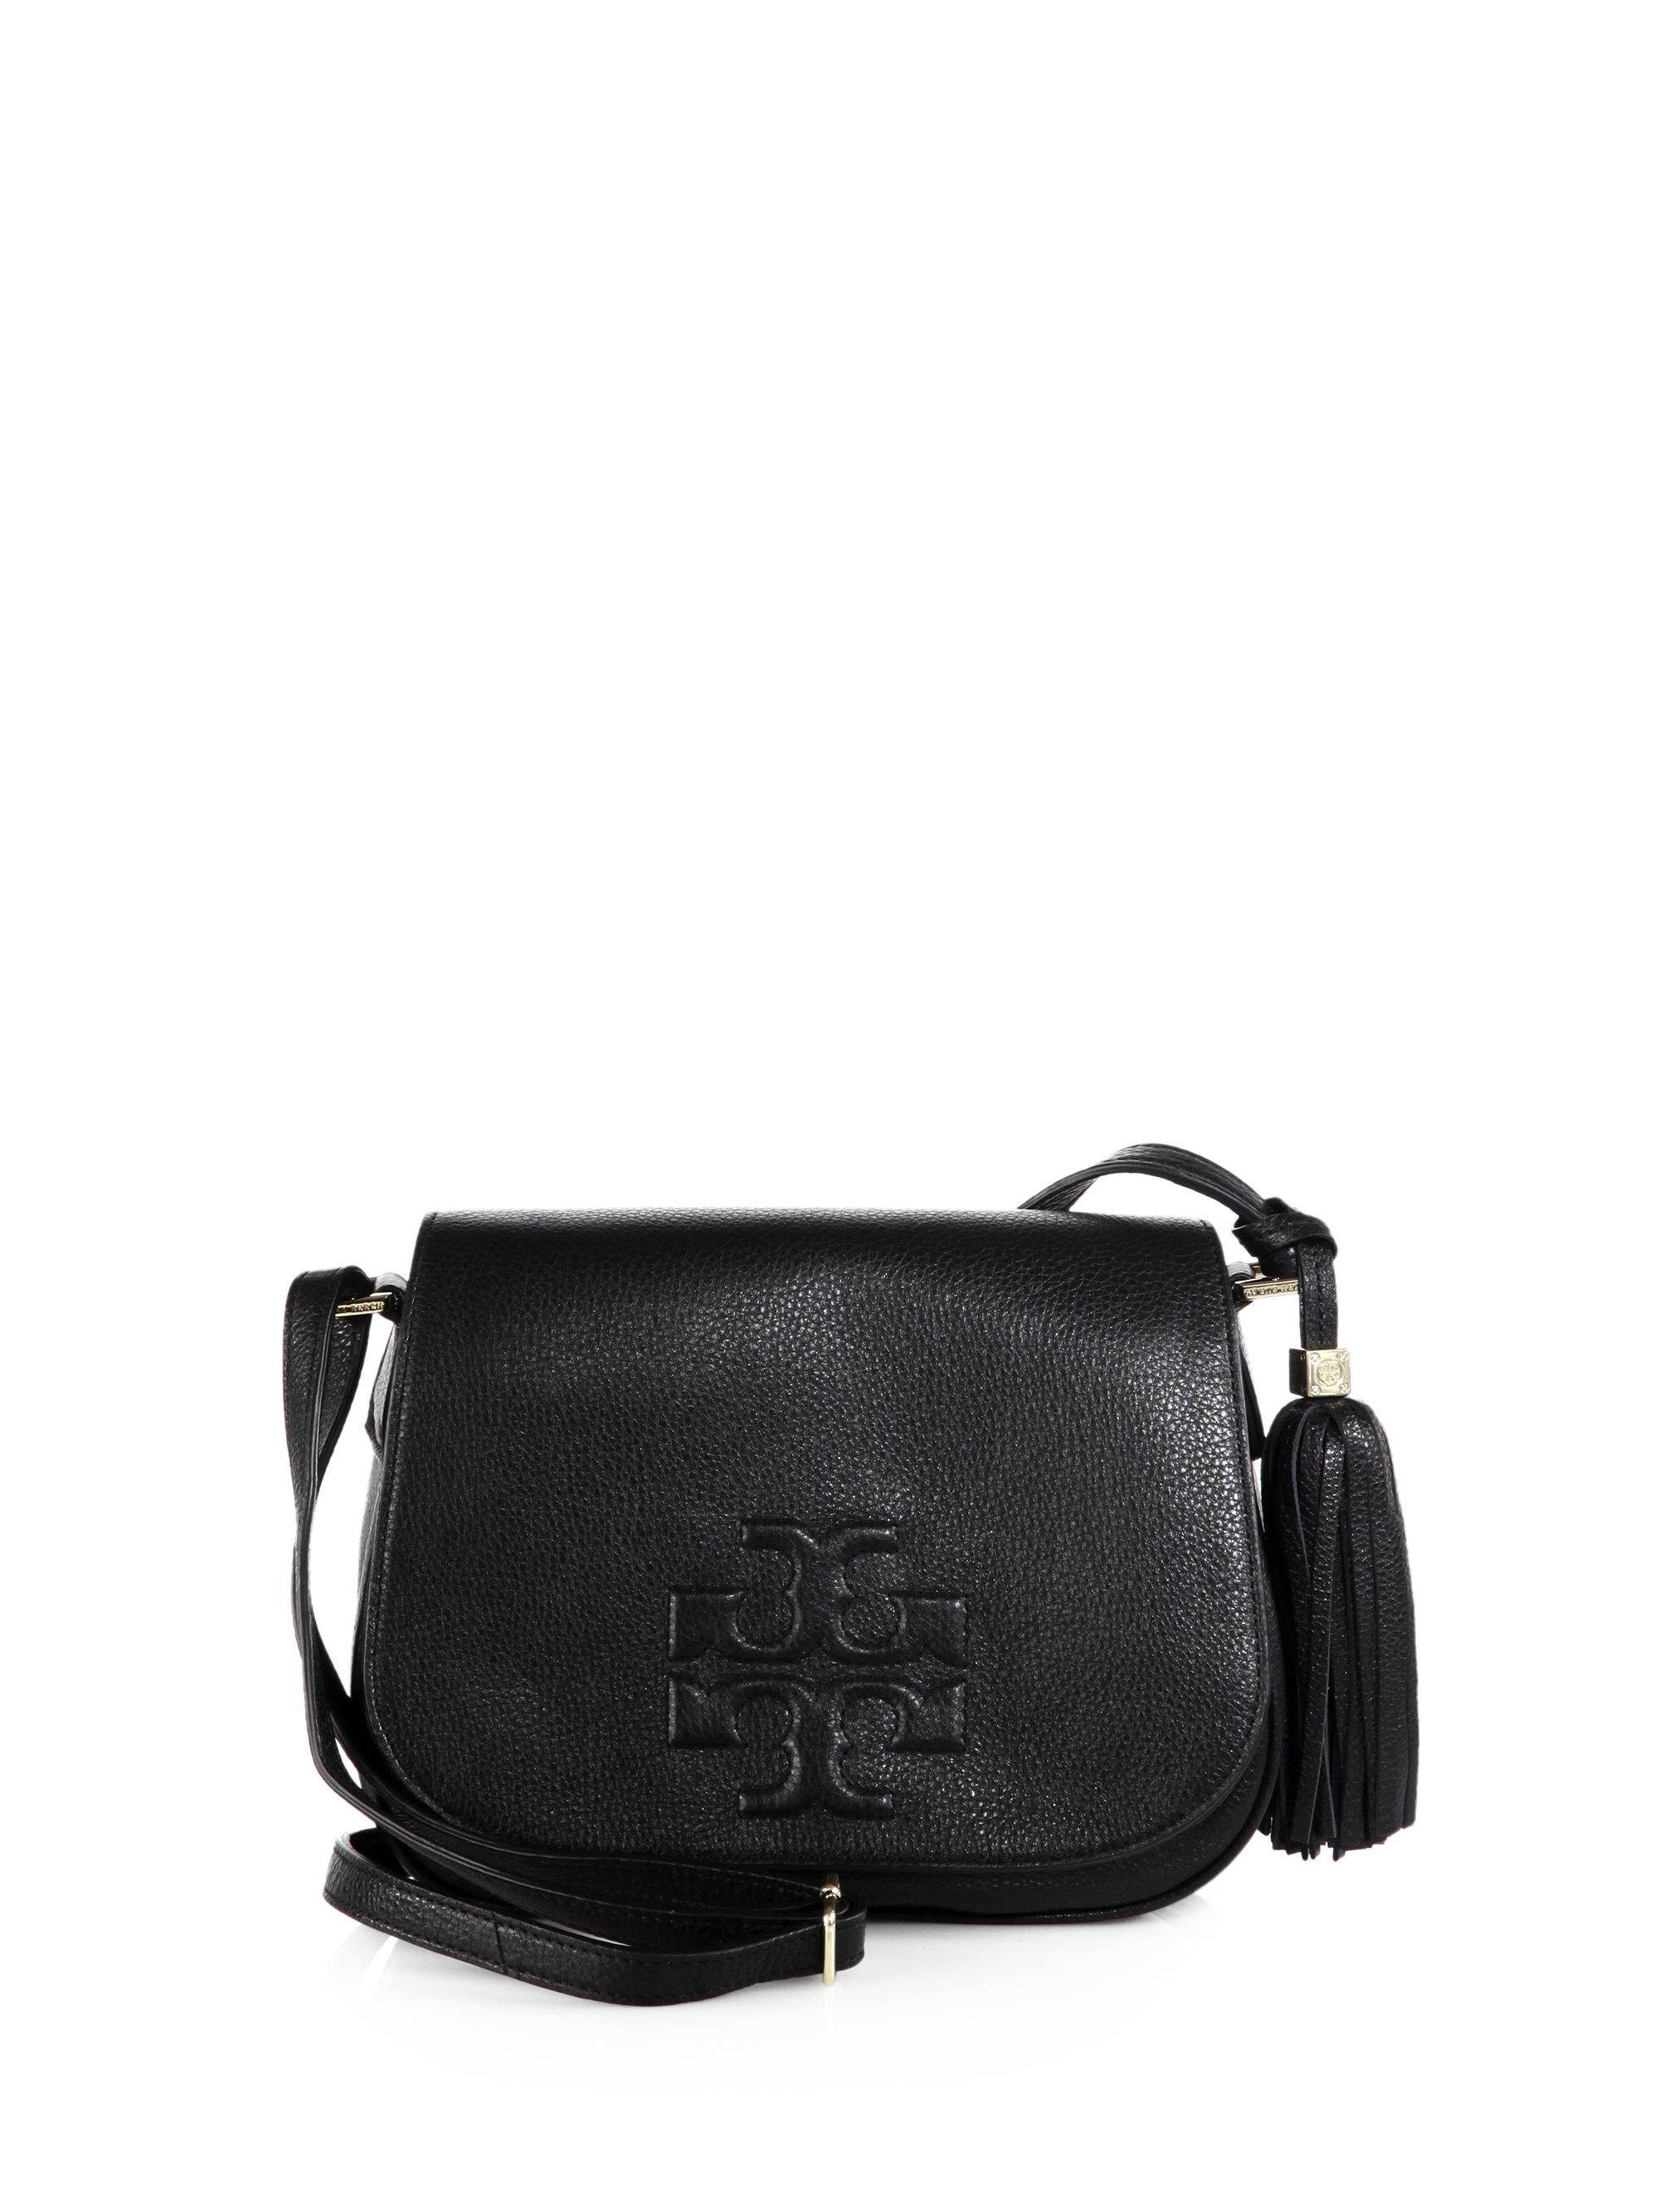 6d56ede03b9f3 Lyst - Tory Burch Thea Leather Fringe Crossbody Bag in Black